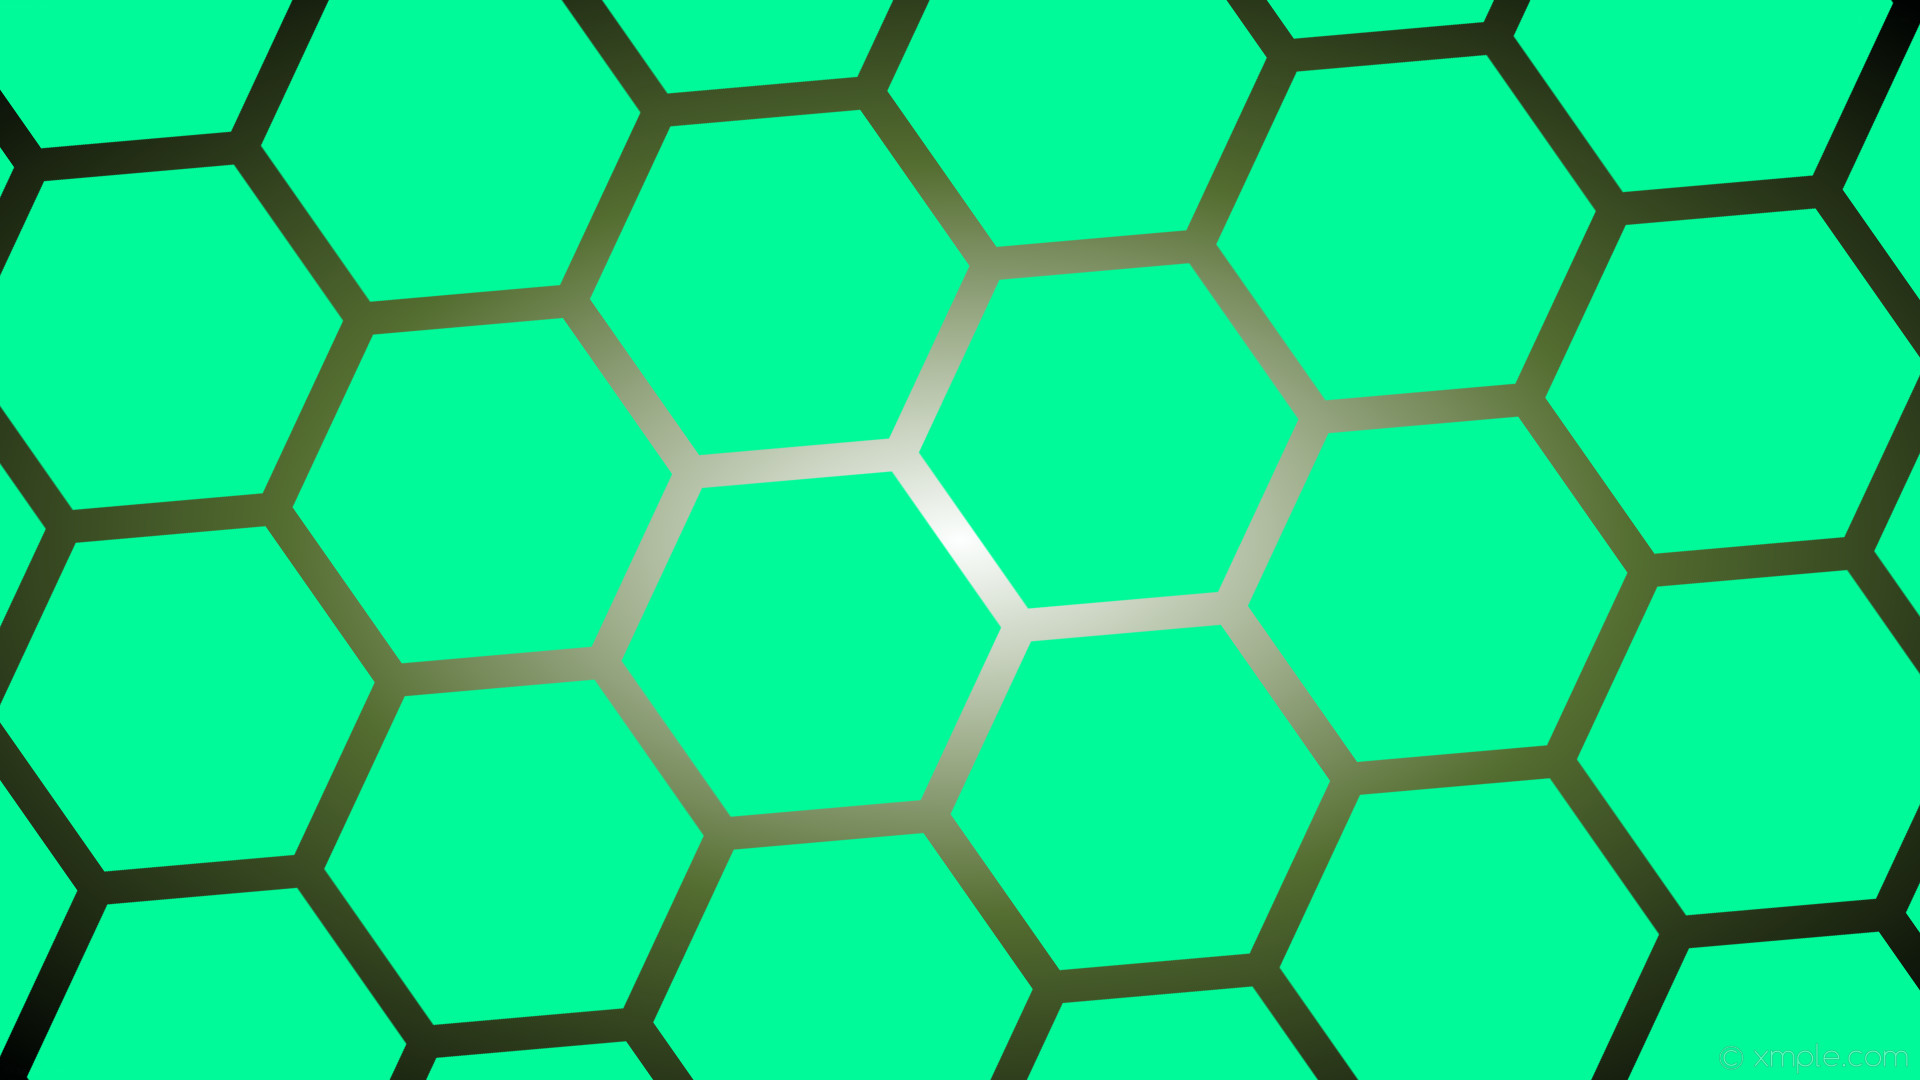 Res: 1920x1080, wallpaper hexagon white black green glow gradient medium spring green dark  olive green #00fa9a #